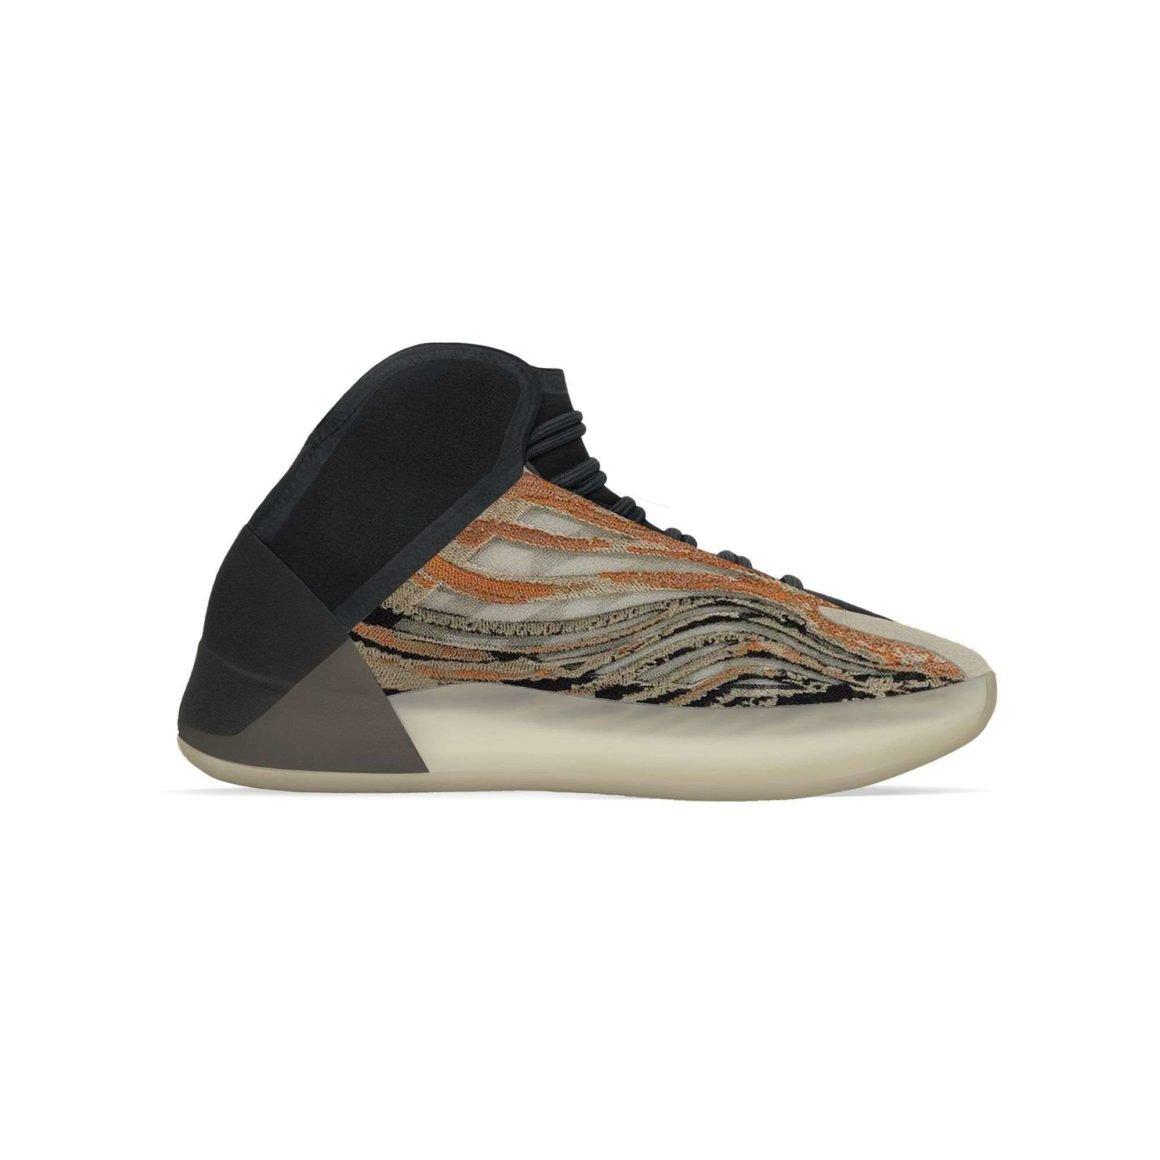 adidas-YEEZY-QNTM-FLASH-ORANGE-Release-2021